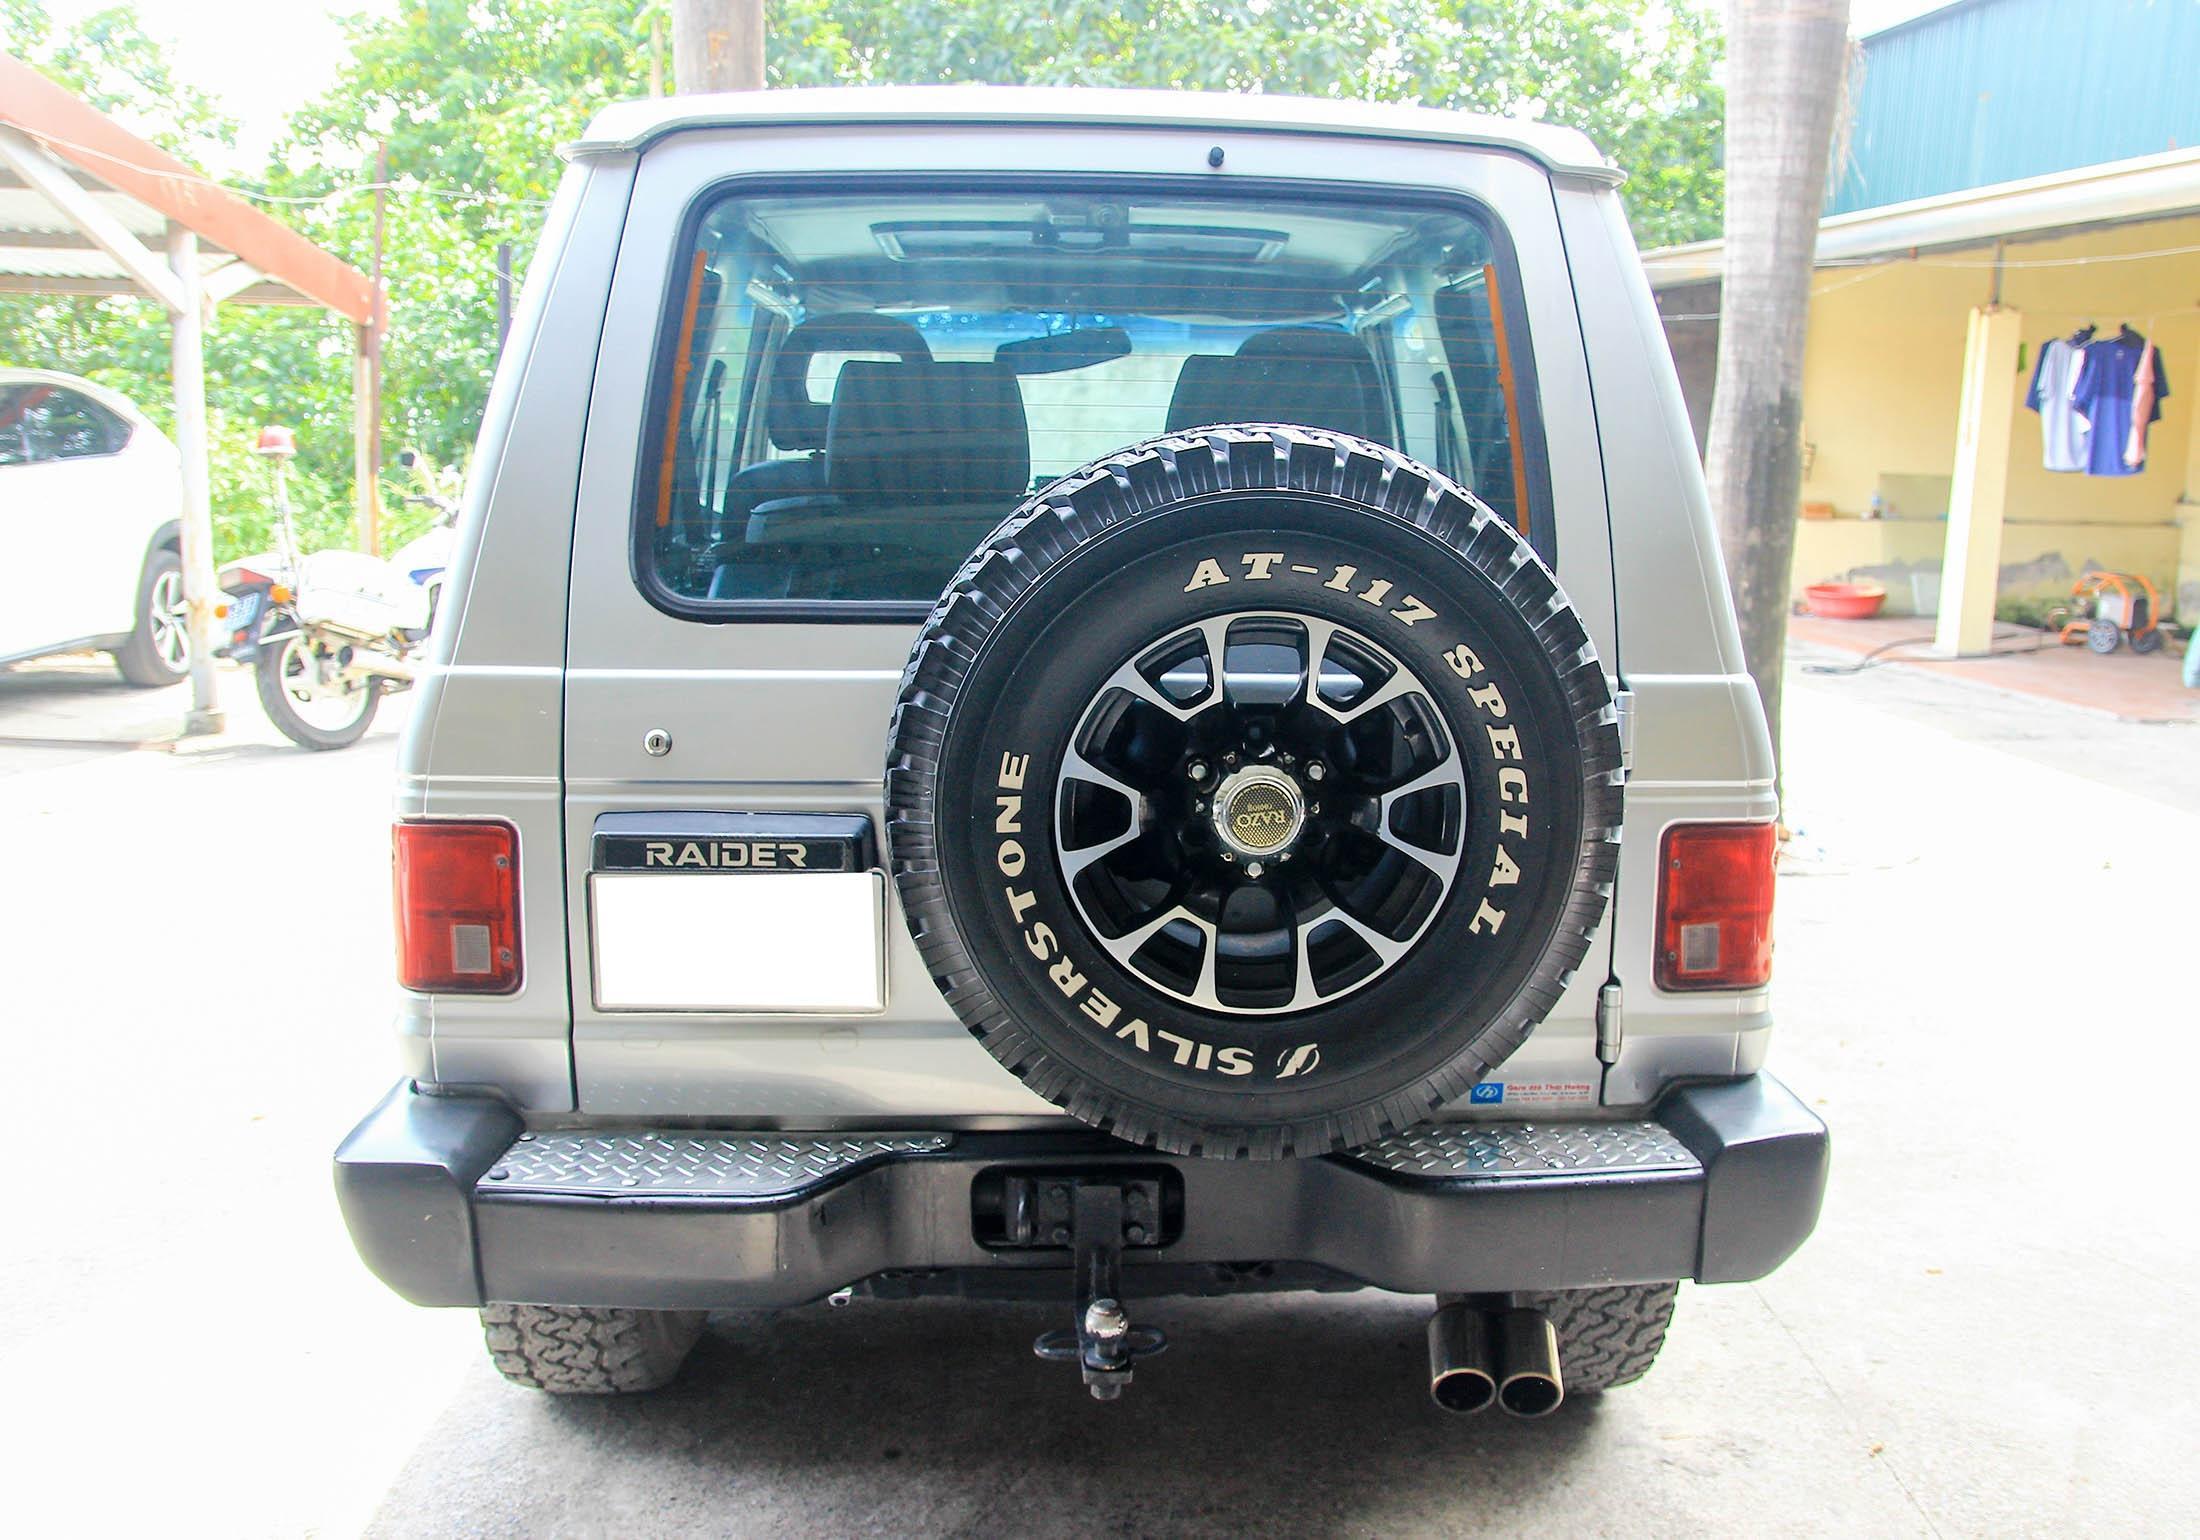 Chi tiết Dodge Raider - xe cổ hiếm gặp tại Việt Nam Ảnh 5